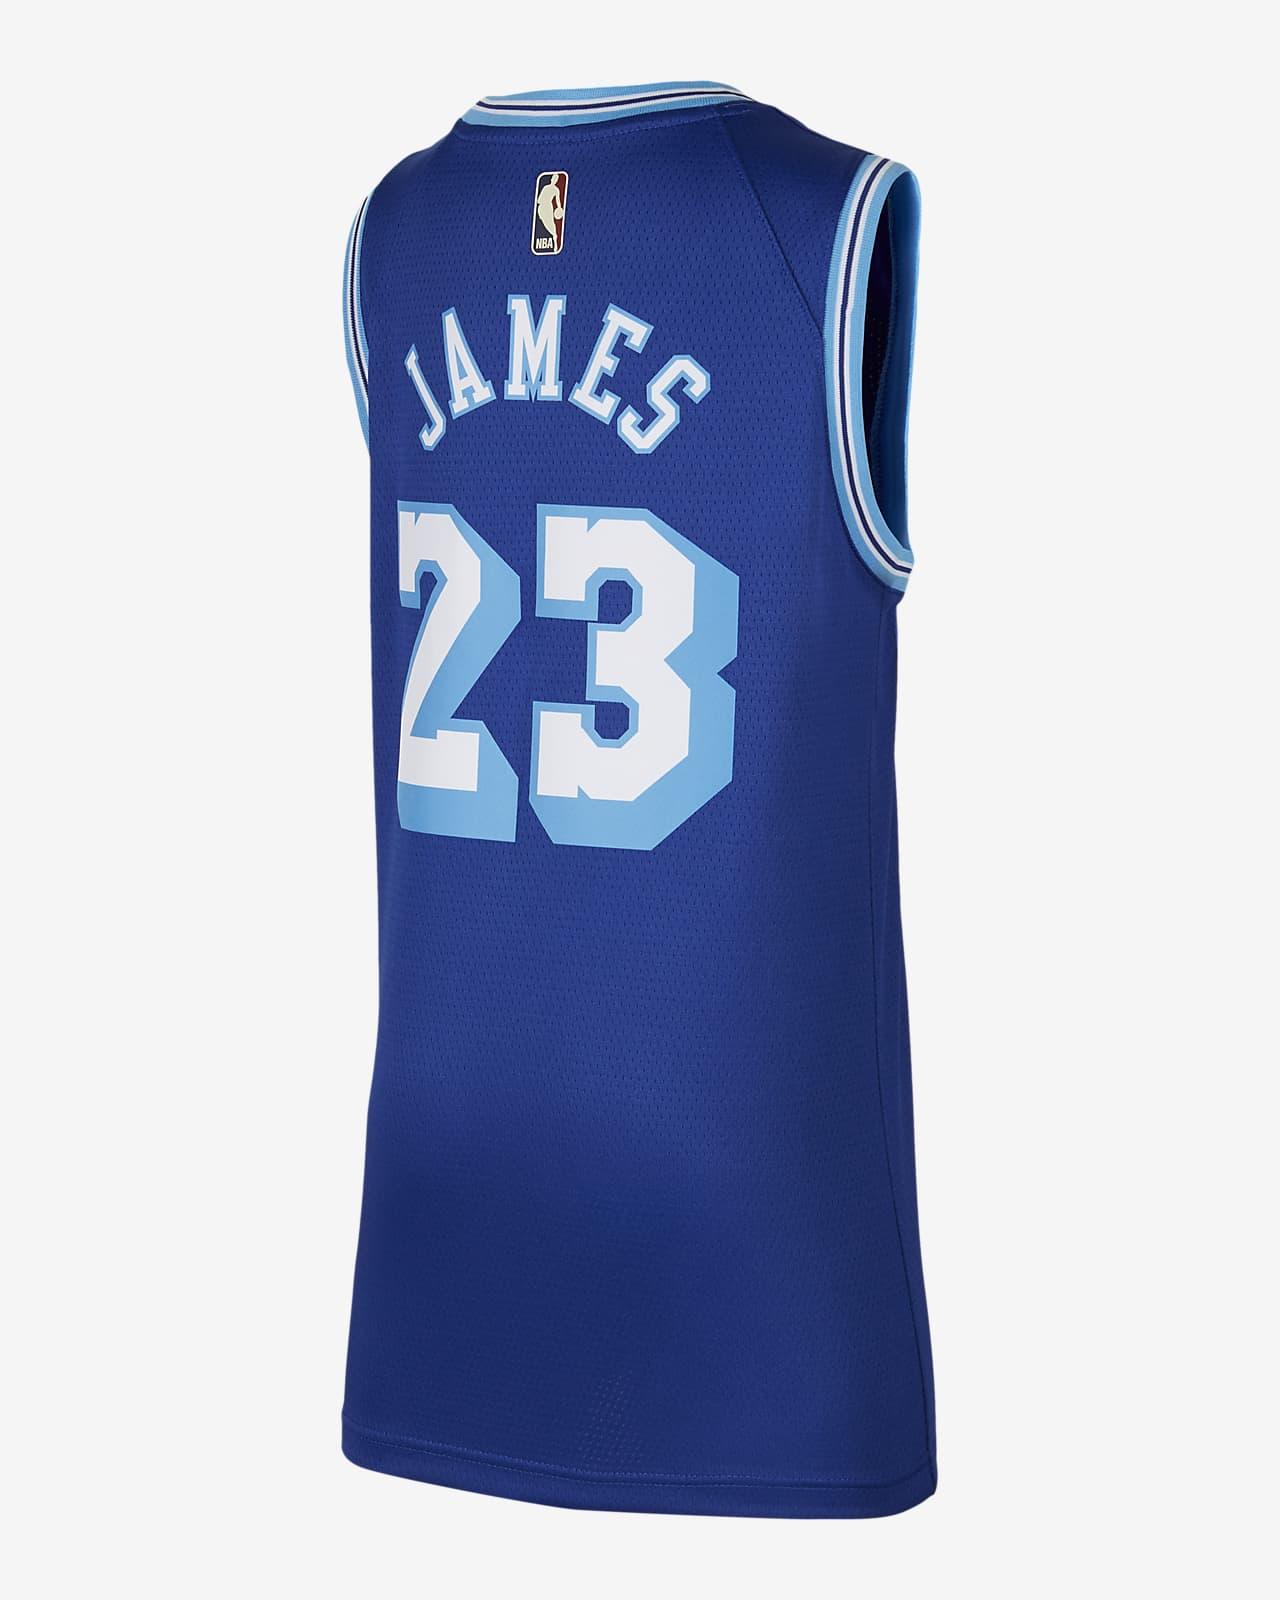 lebron james blue jersey